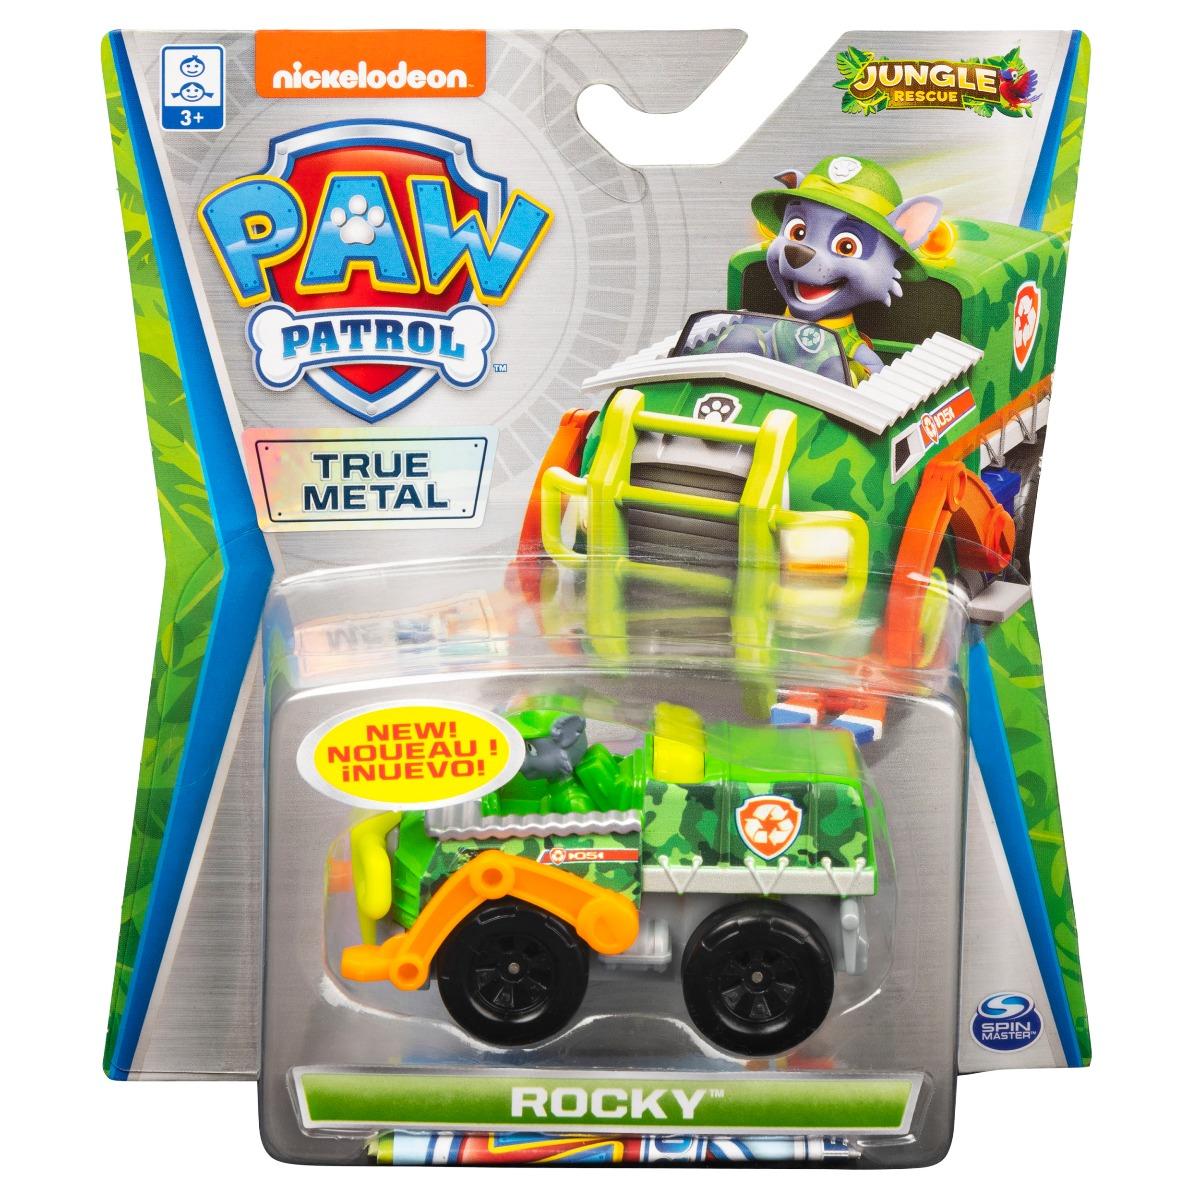 Masinuta cu figurina Paw Patrol True Metal, Rocky 20121385